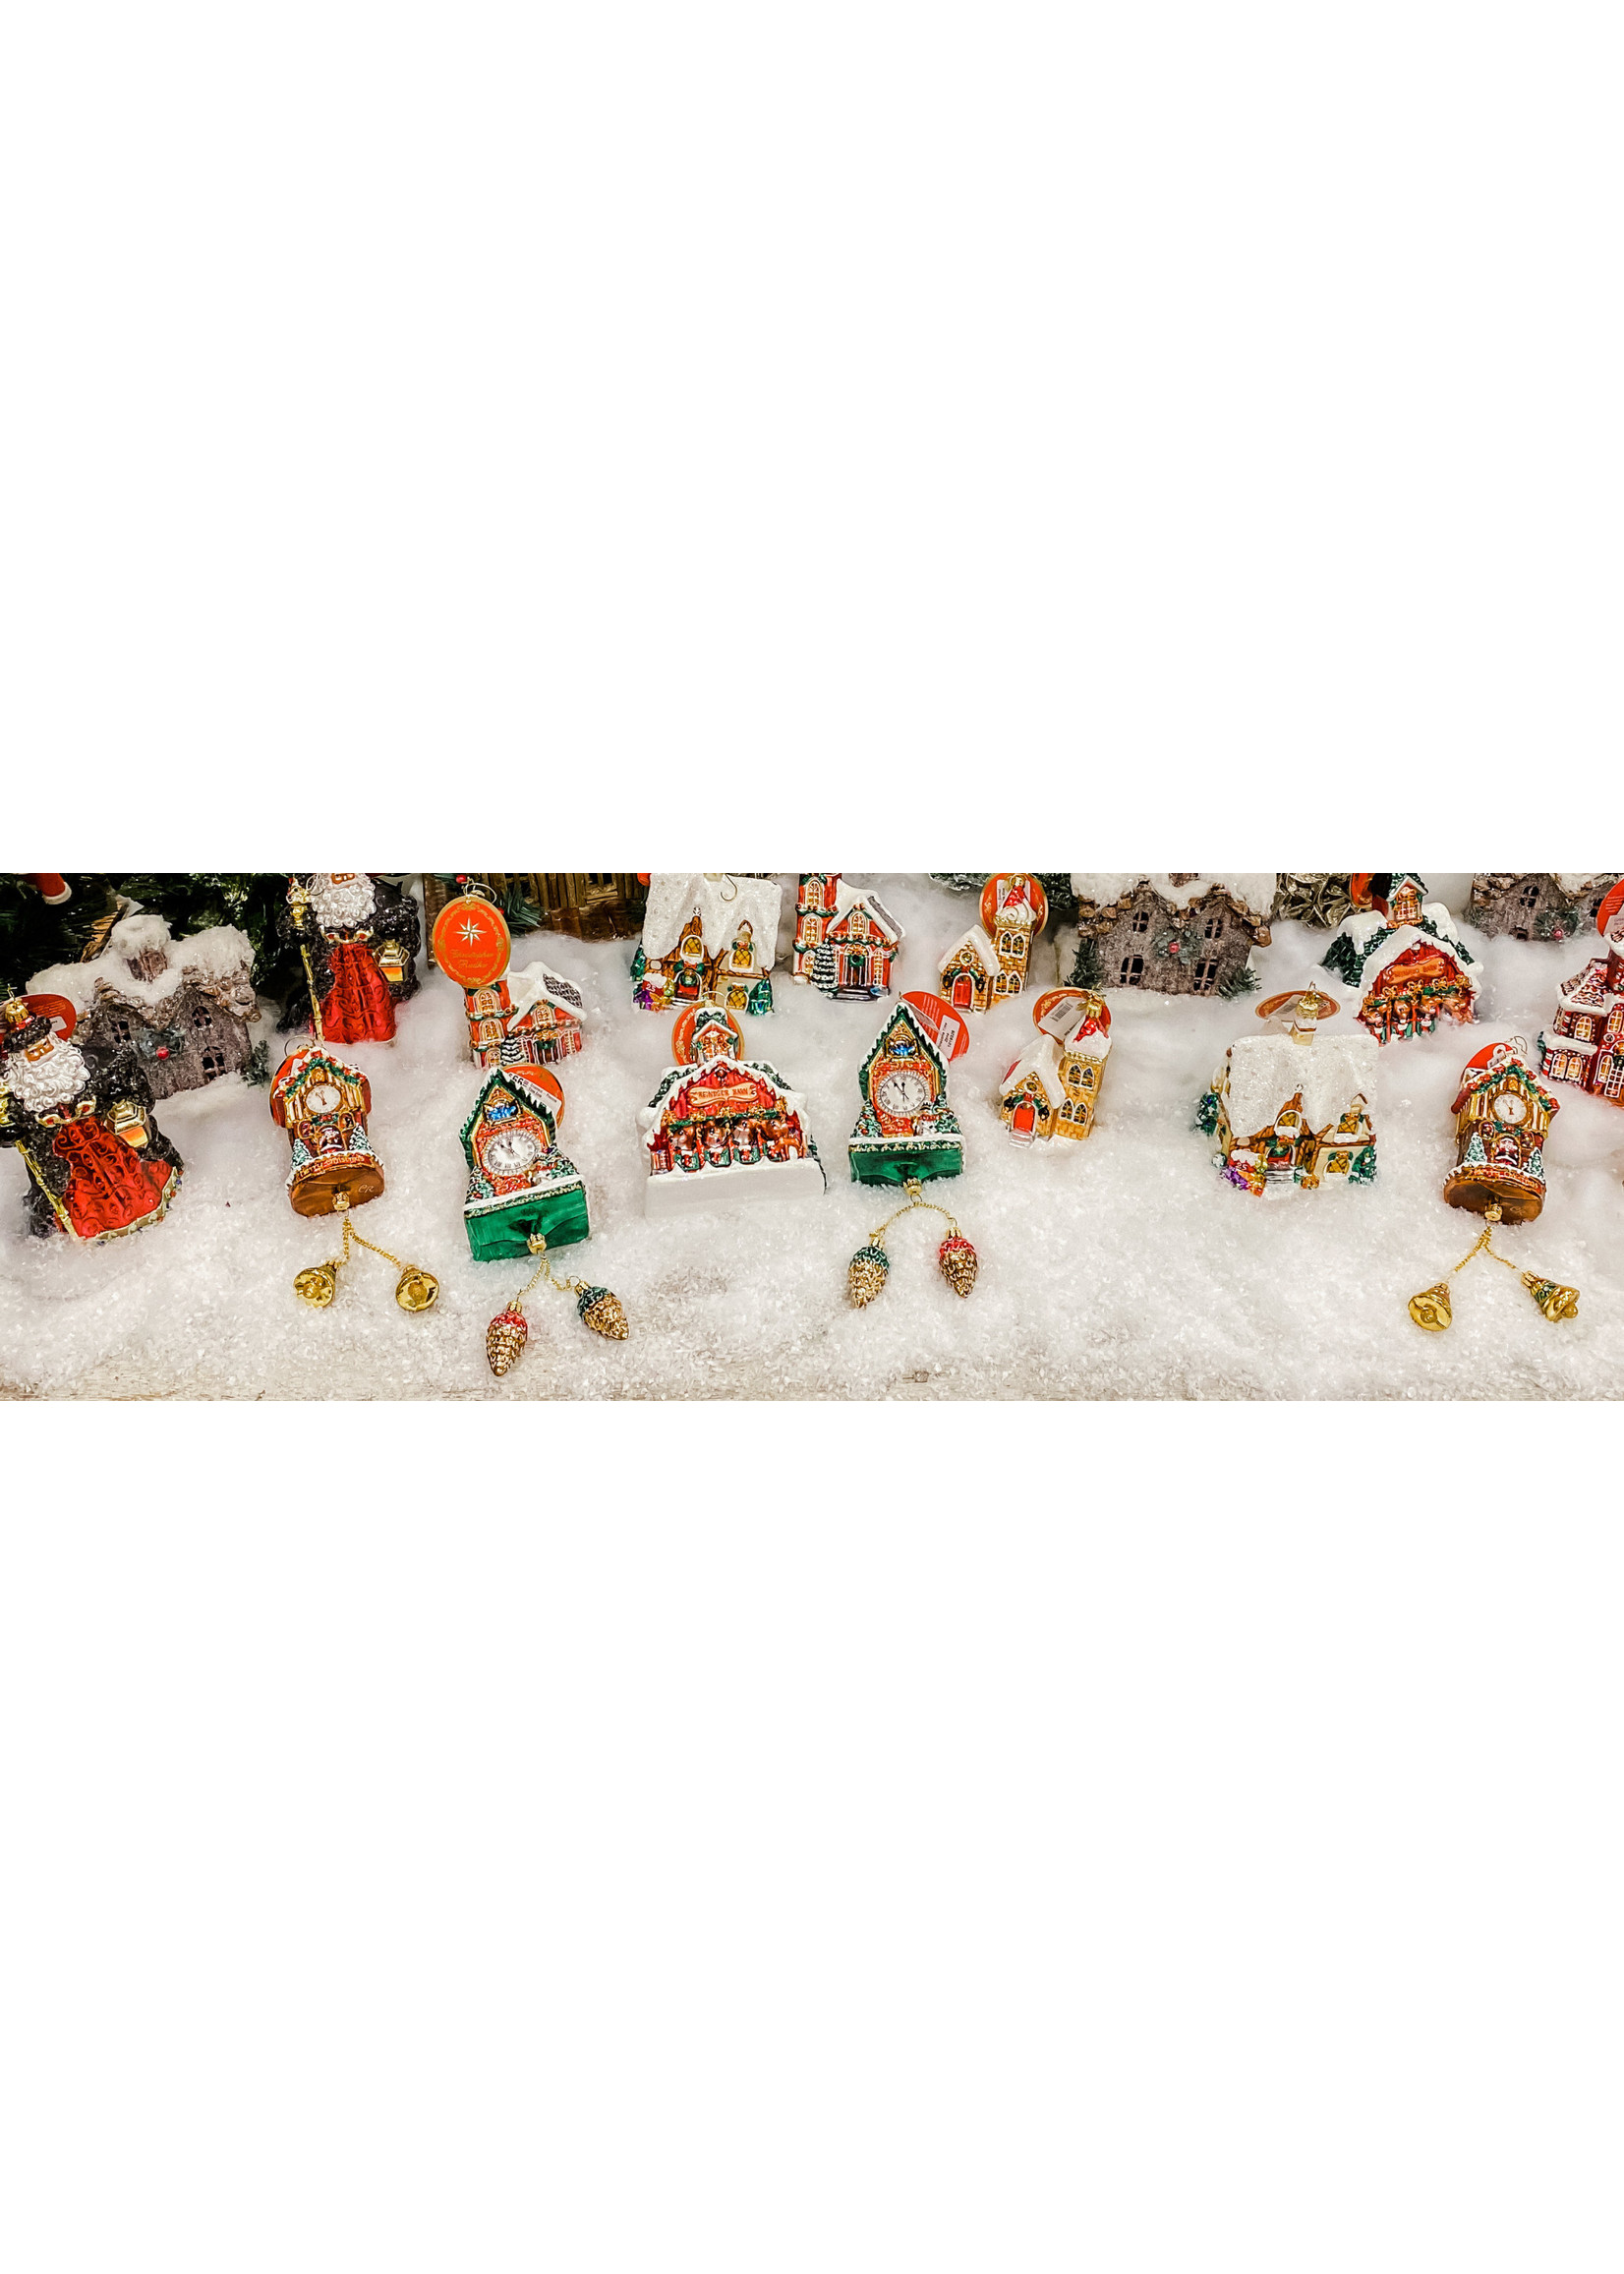 Christopher Radko Ornament - Goodnight Reindeer